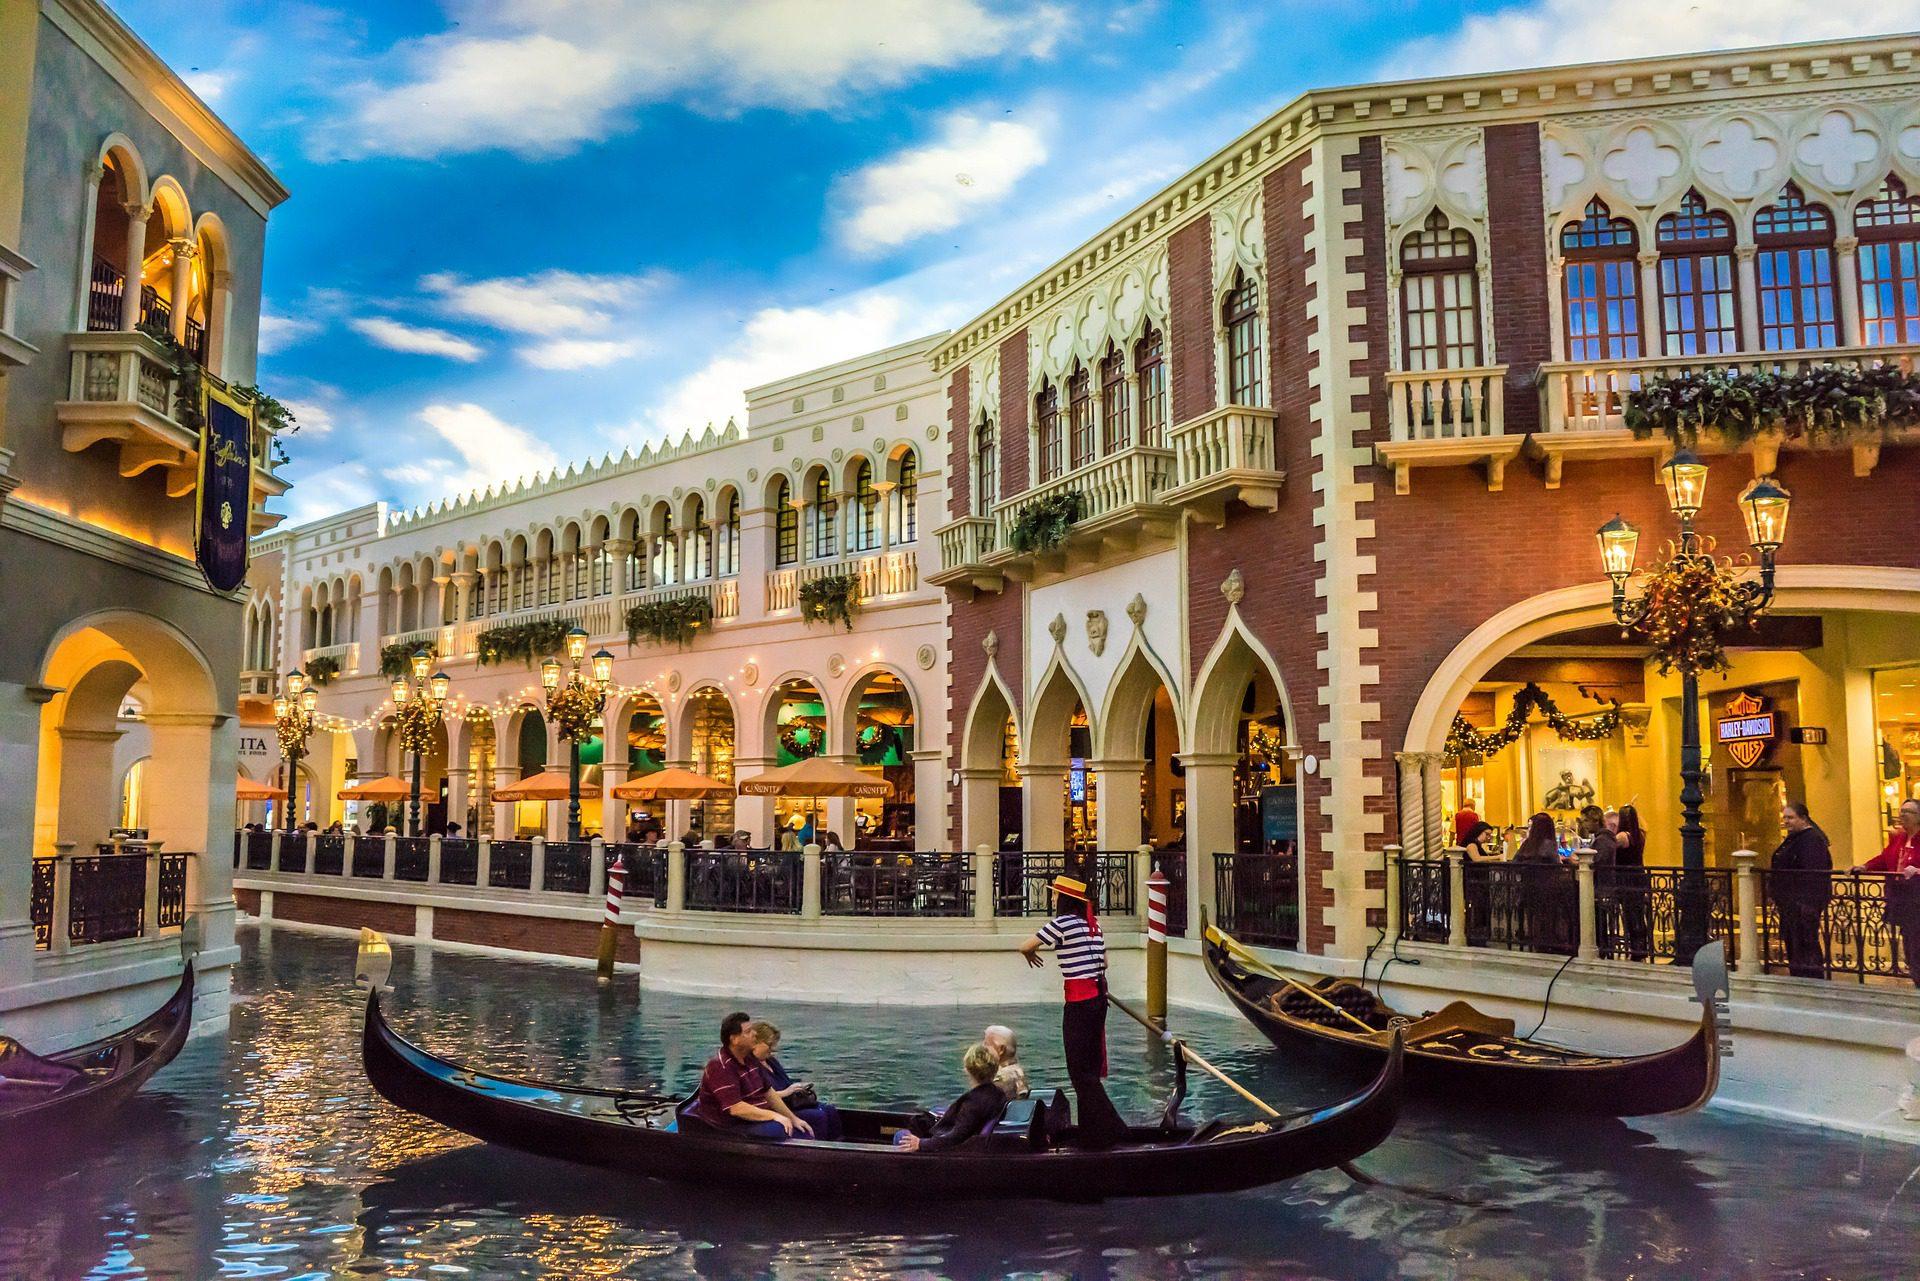 Gondola Rides at The Venetian Resort, Las Vegas